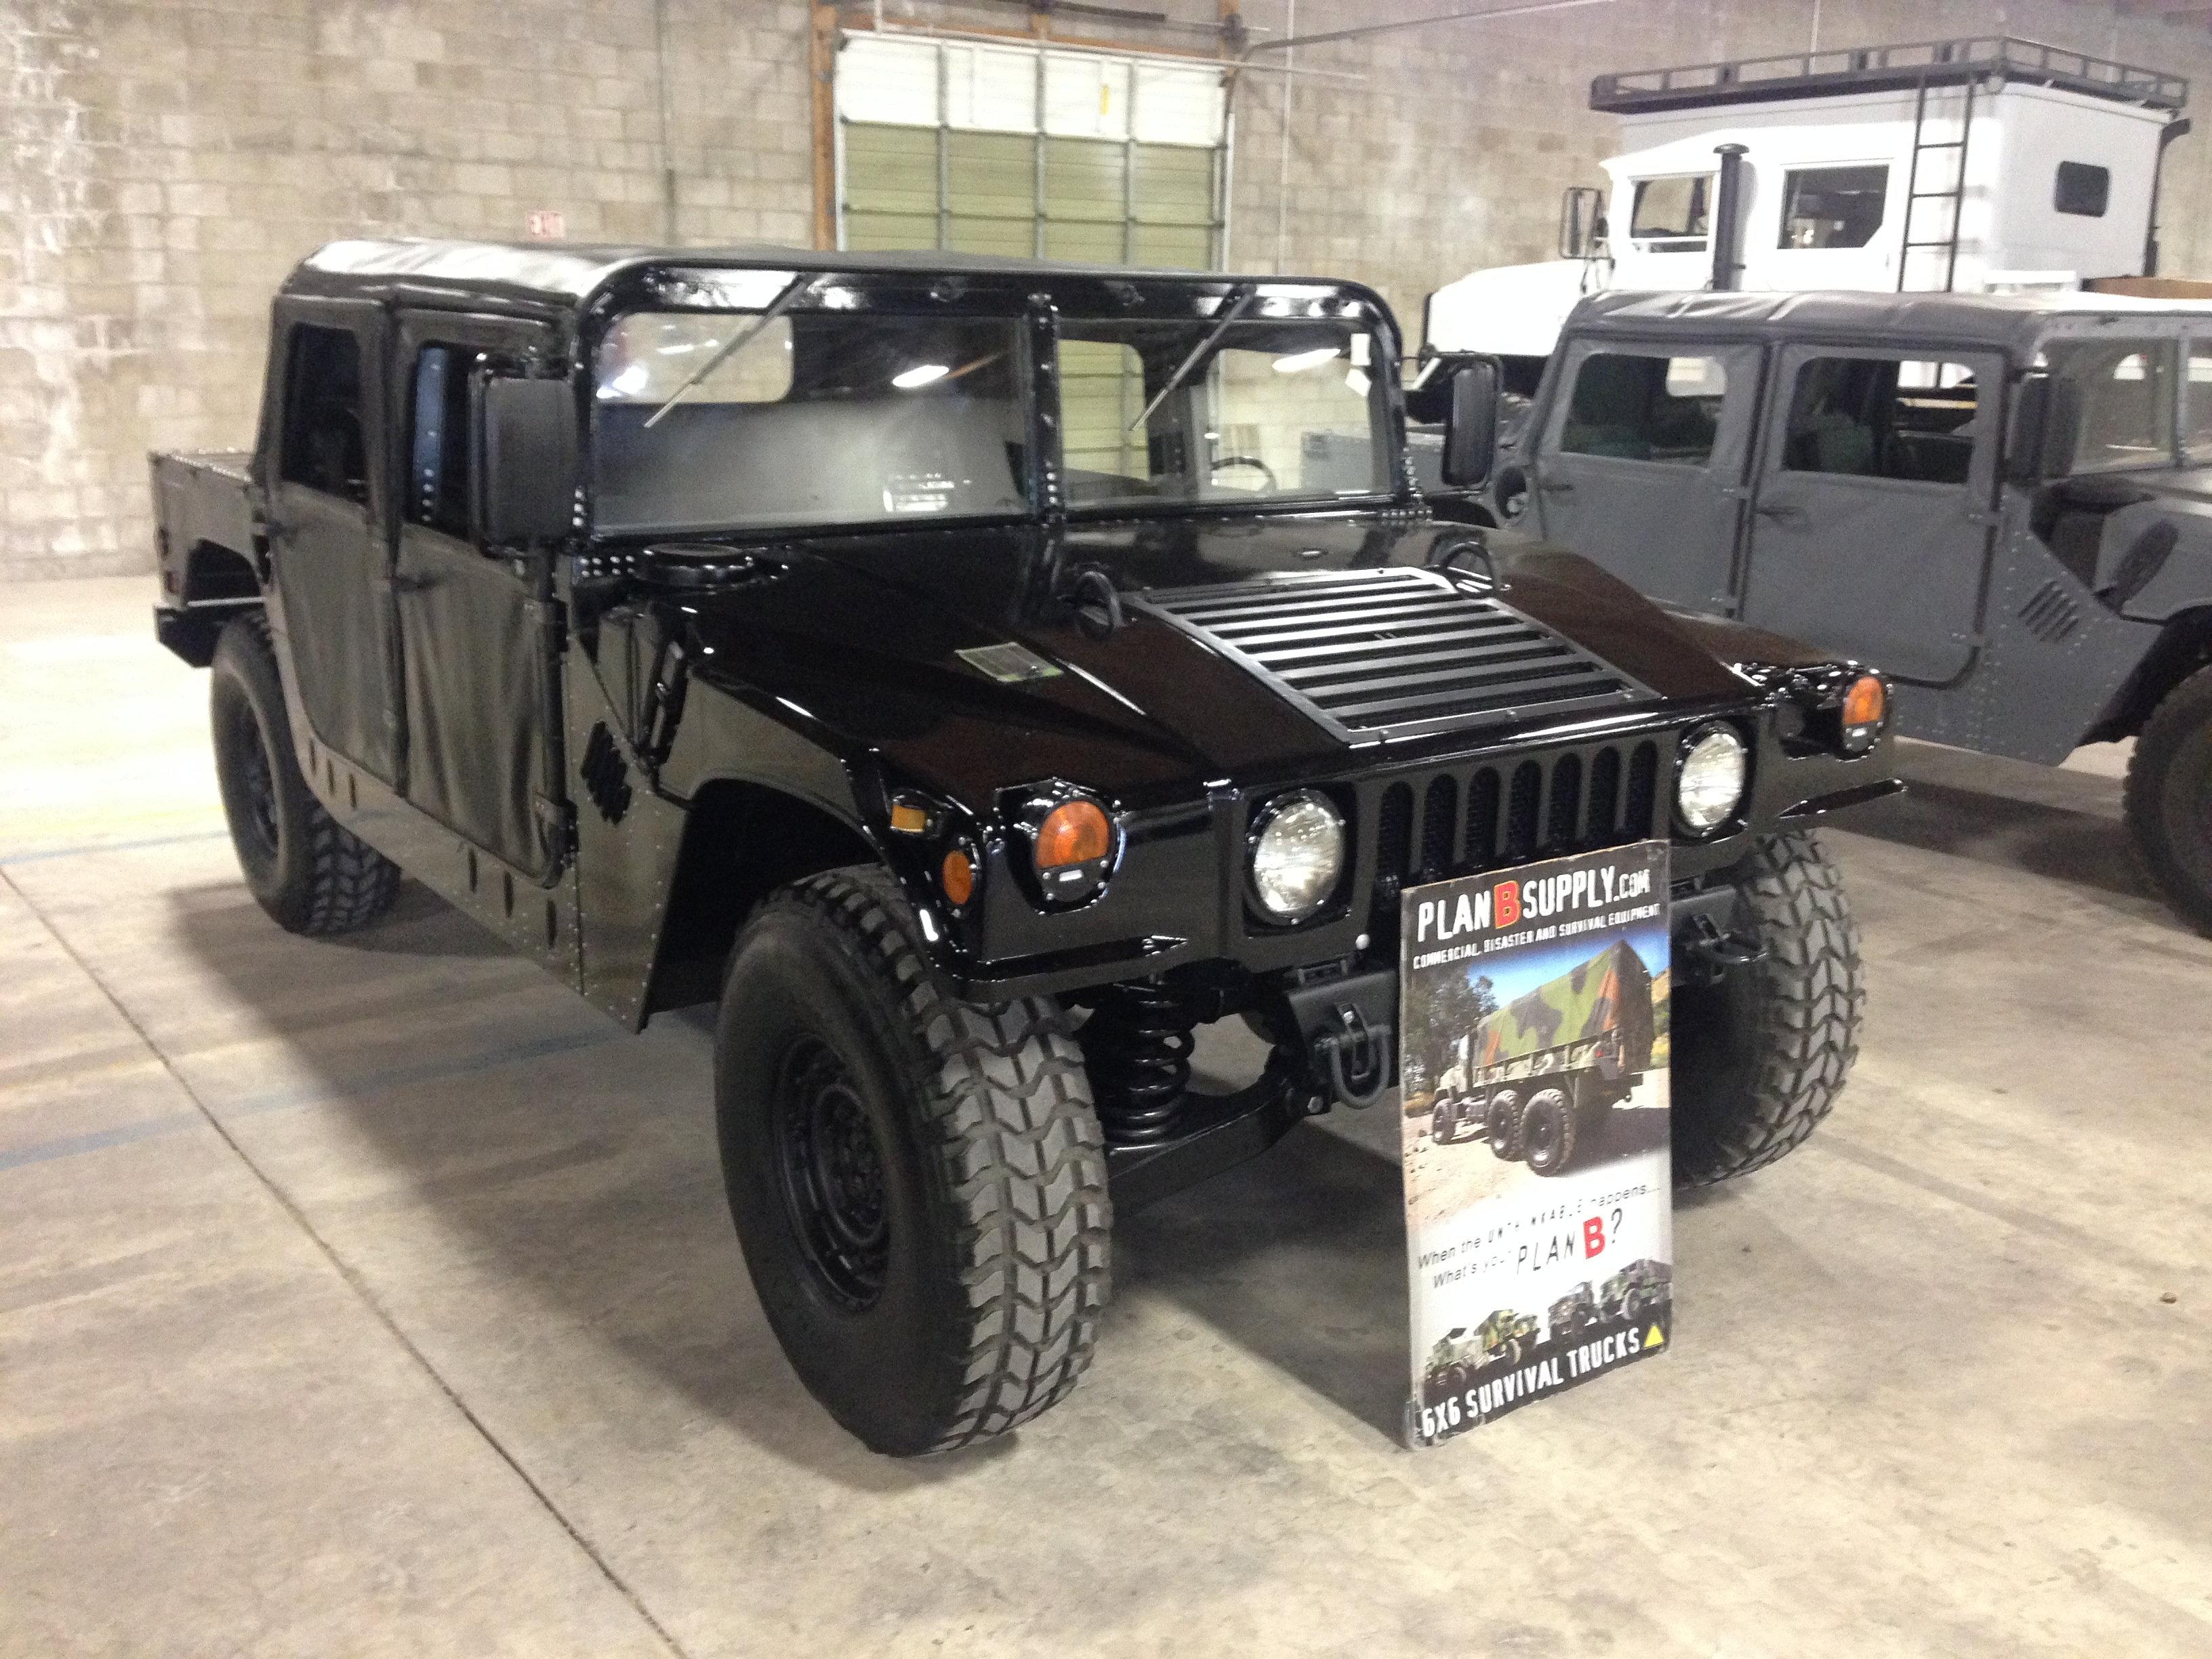 Worksheet. Military Hummer Humvee Hmmwv H1 for sale utah